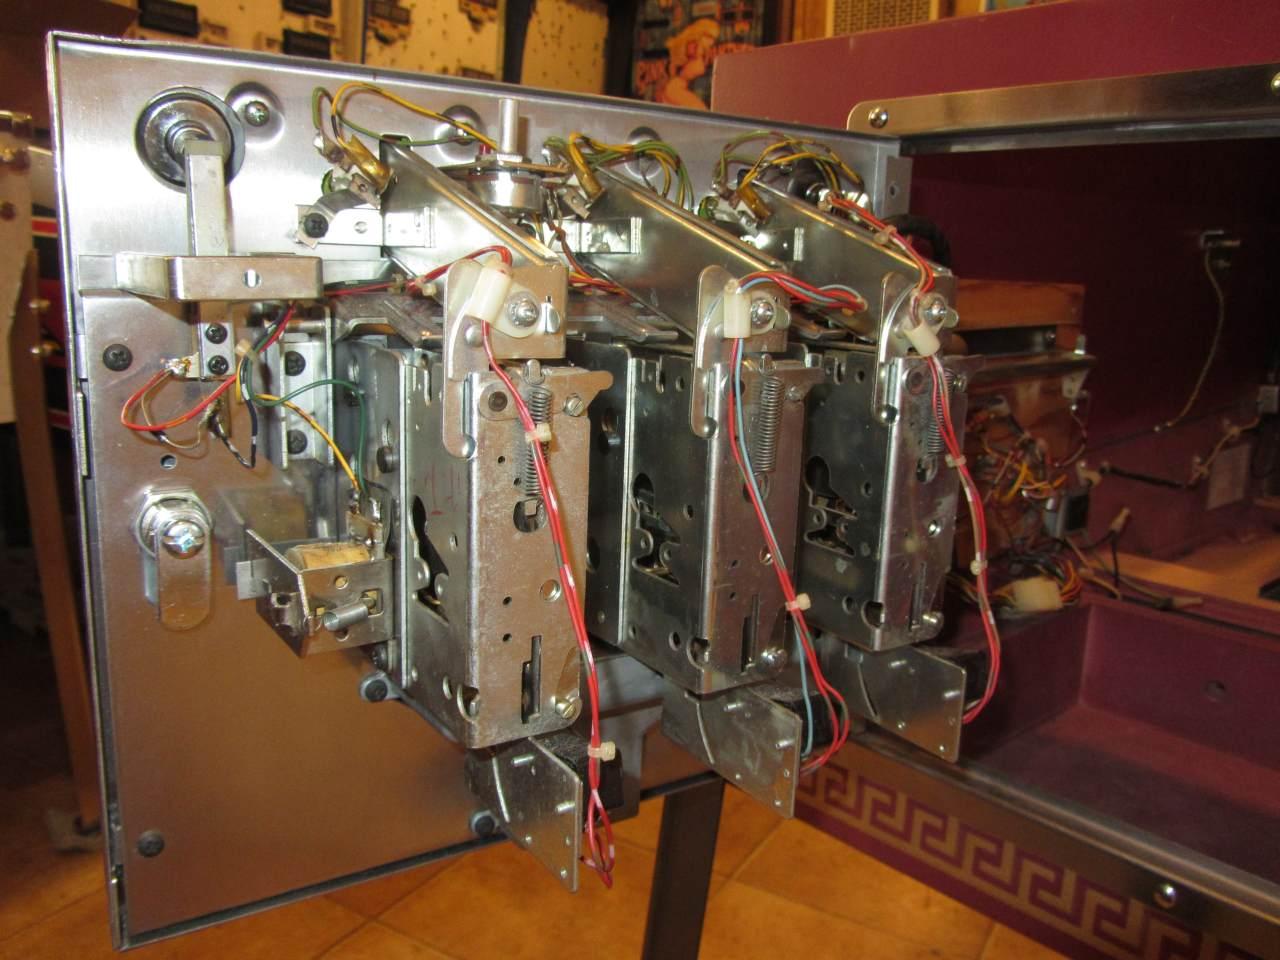 Bally Medusa Pinball Machine 2 Pinballmania Llc